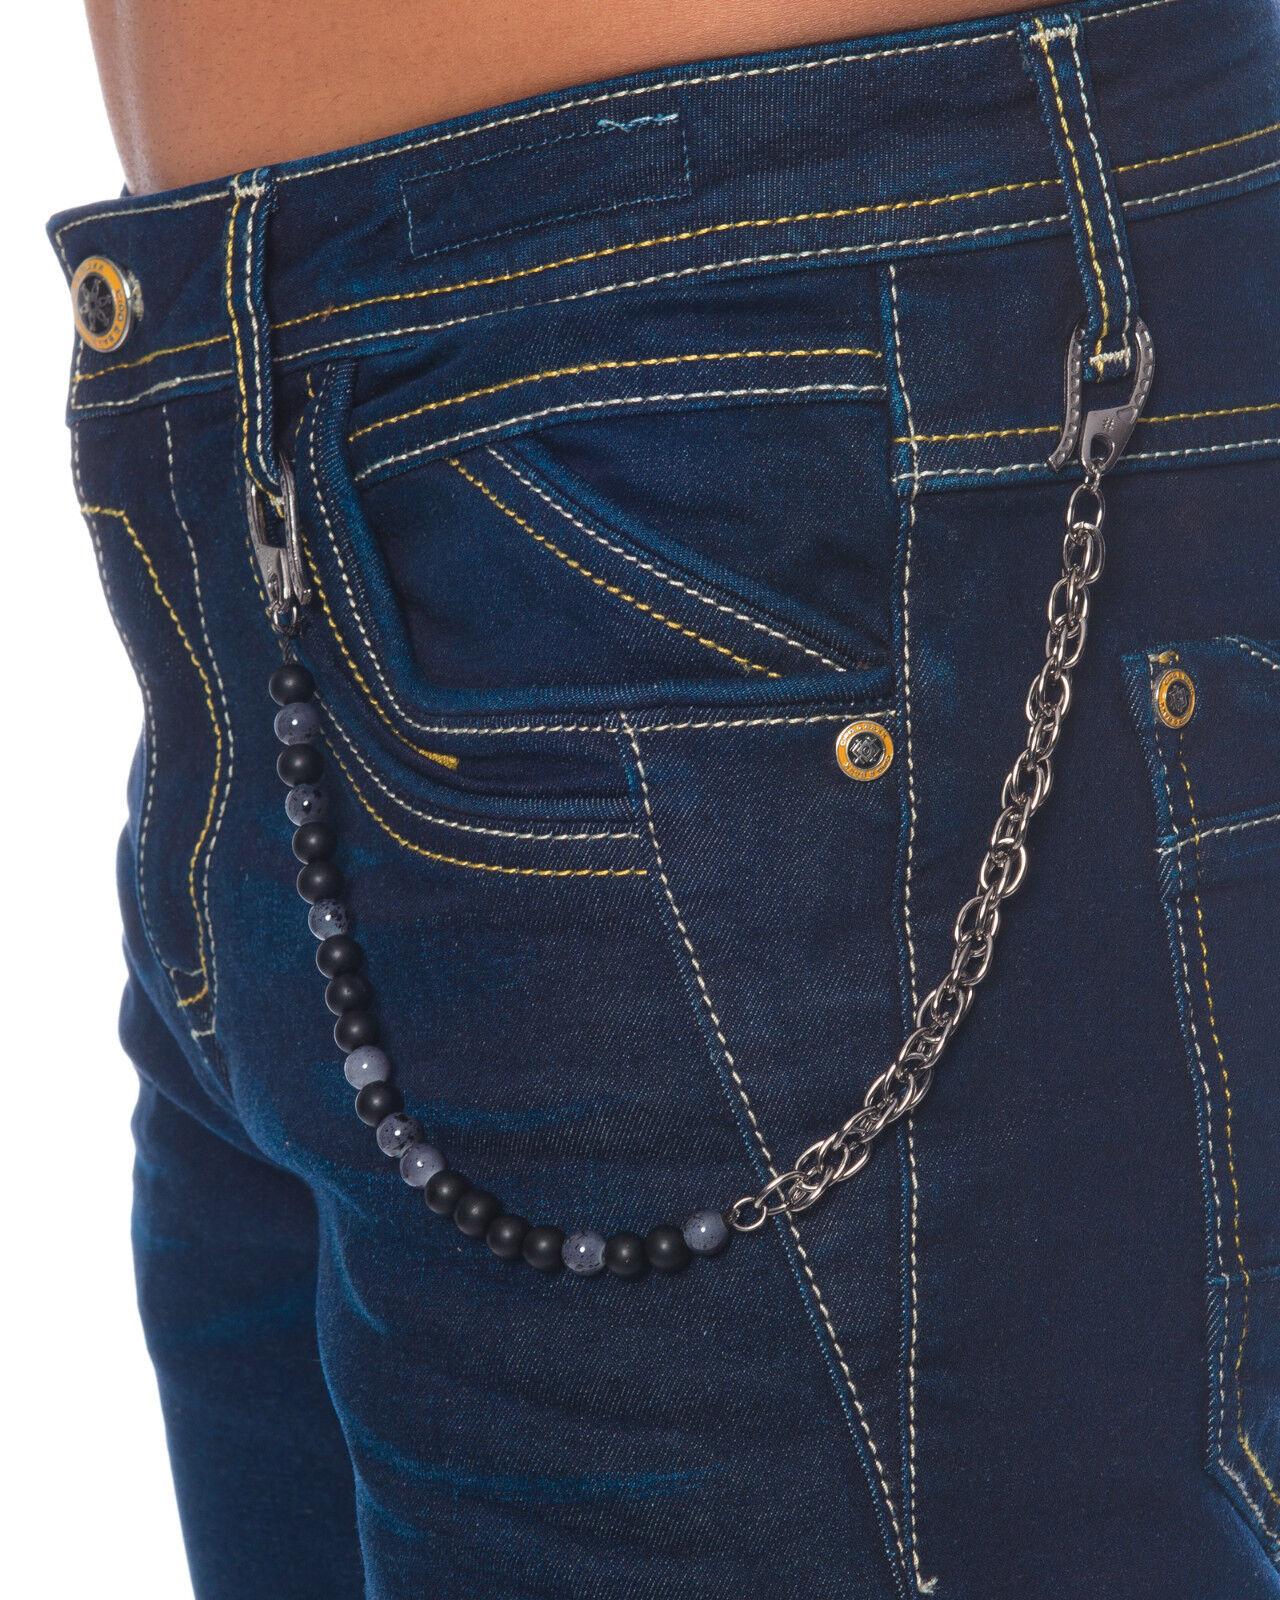 Cipo & Baxx Cuciture Cuciture Cuciture Uomo Pantaloni Jeans 395 BLU NUOVO w28 29 30 31 32 33 34 36 38 40 f5285c